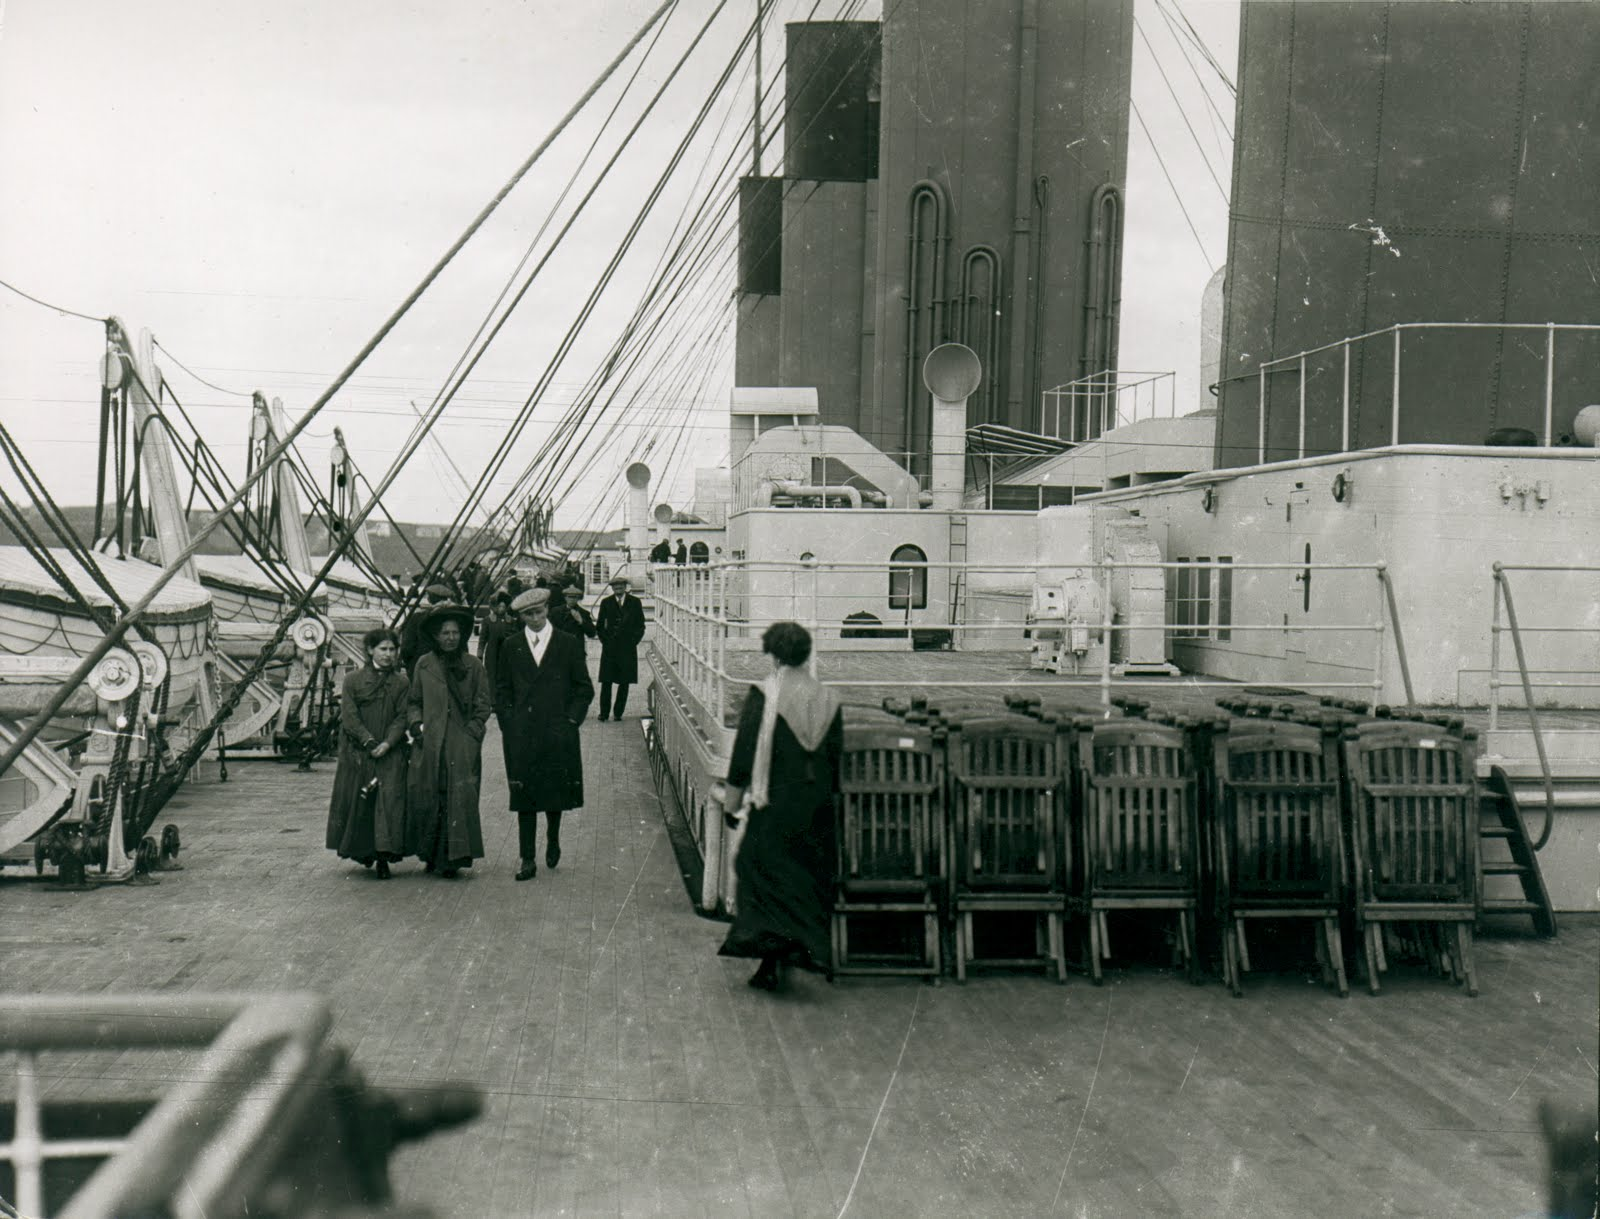 Christmas before Titanic - Página 4 Boat%2BDeck%2B11_4%2B1912